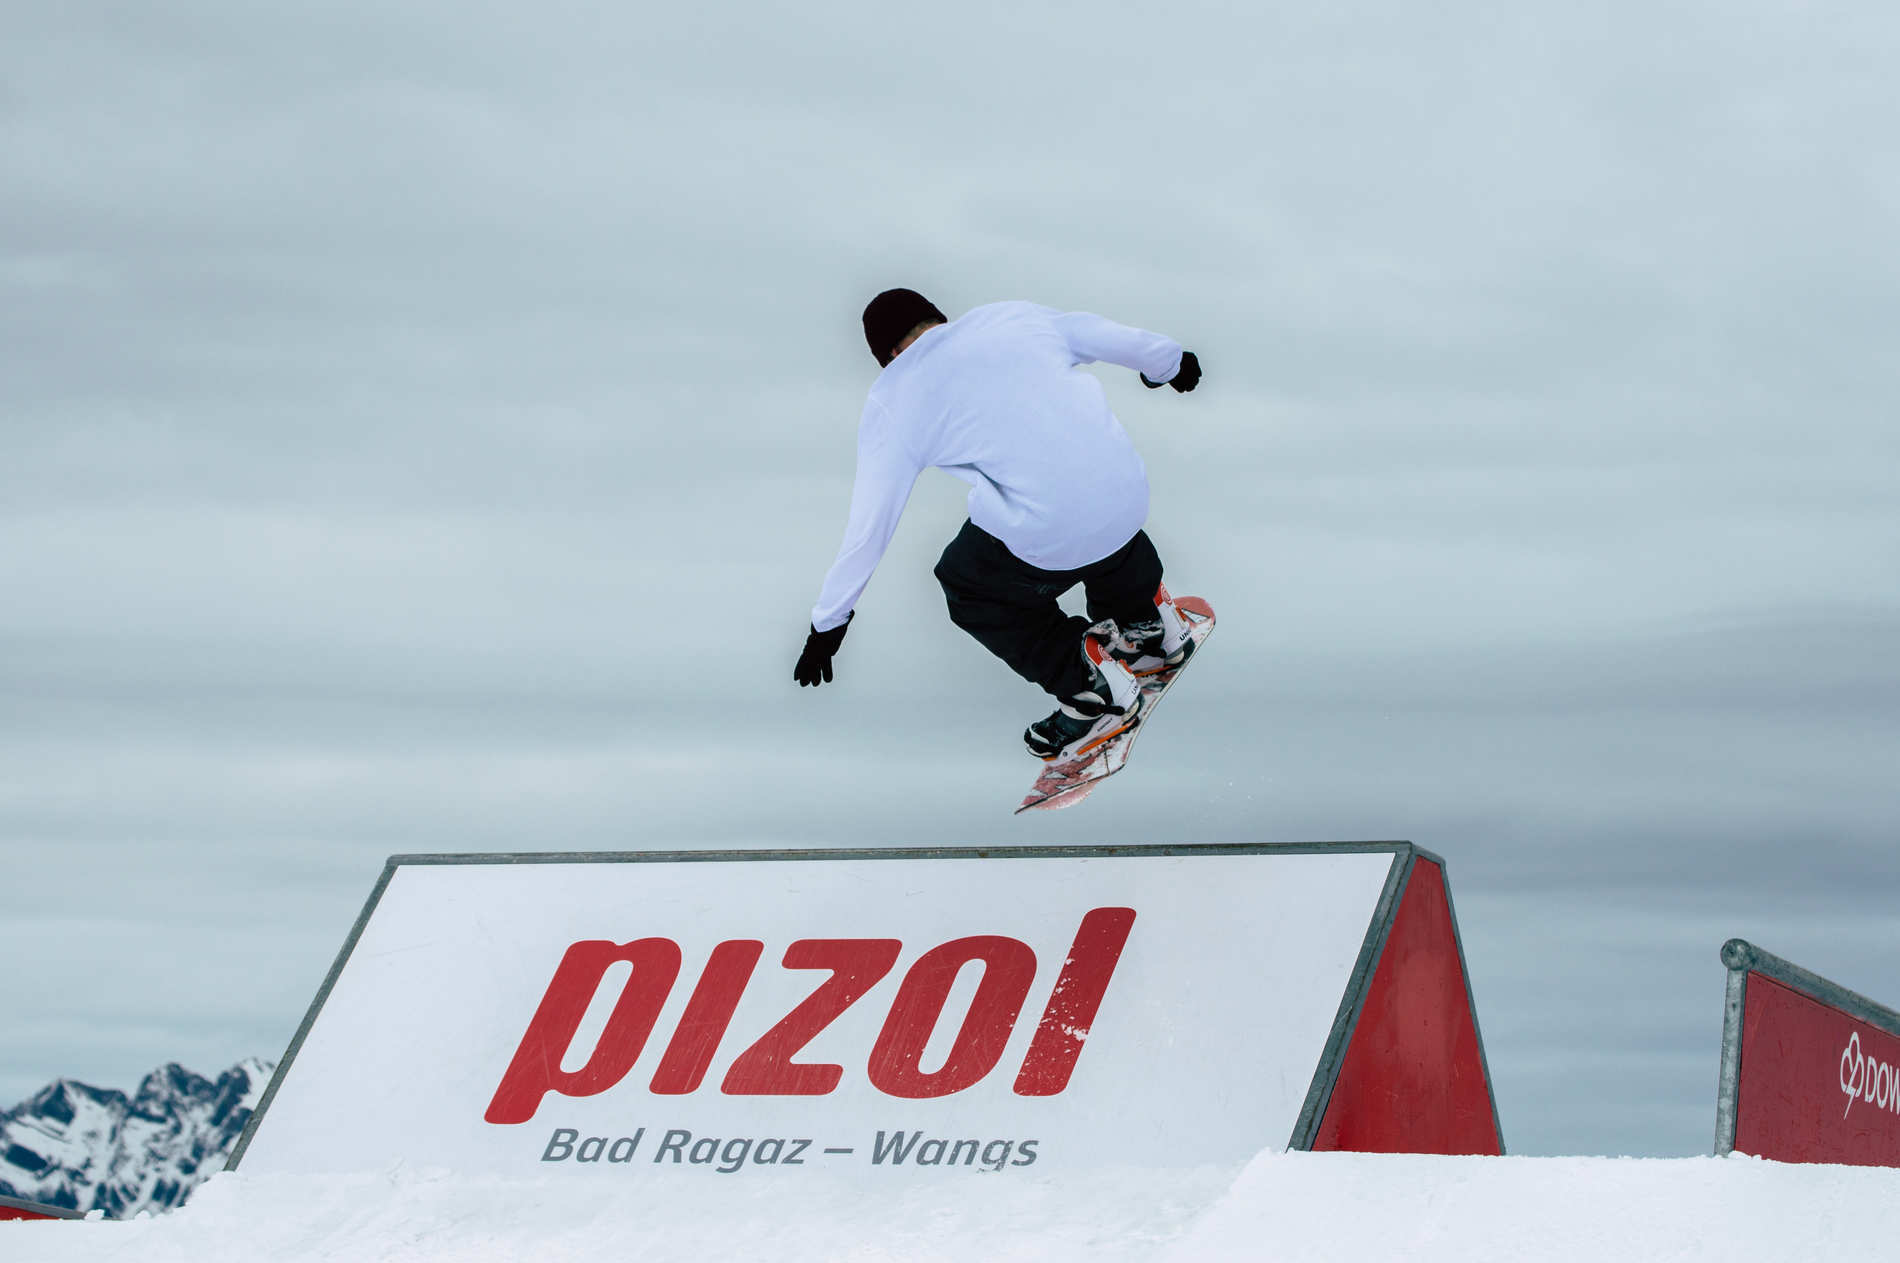 Shredpoker Pizol - Snowboard Edit